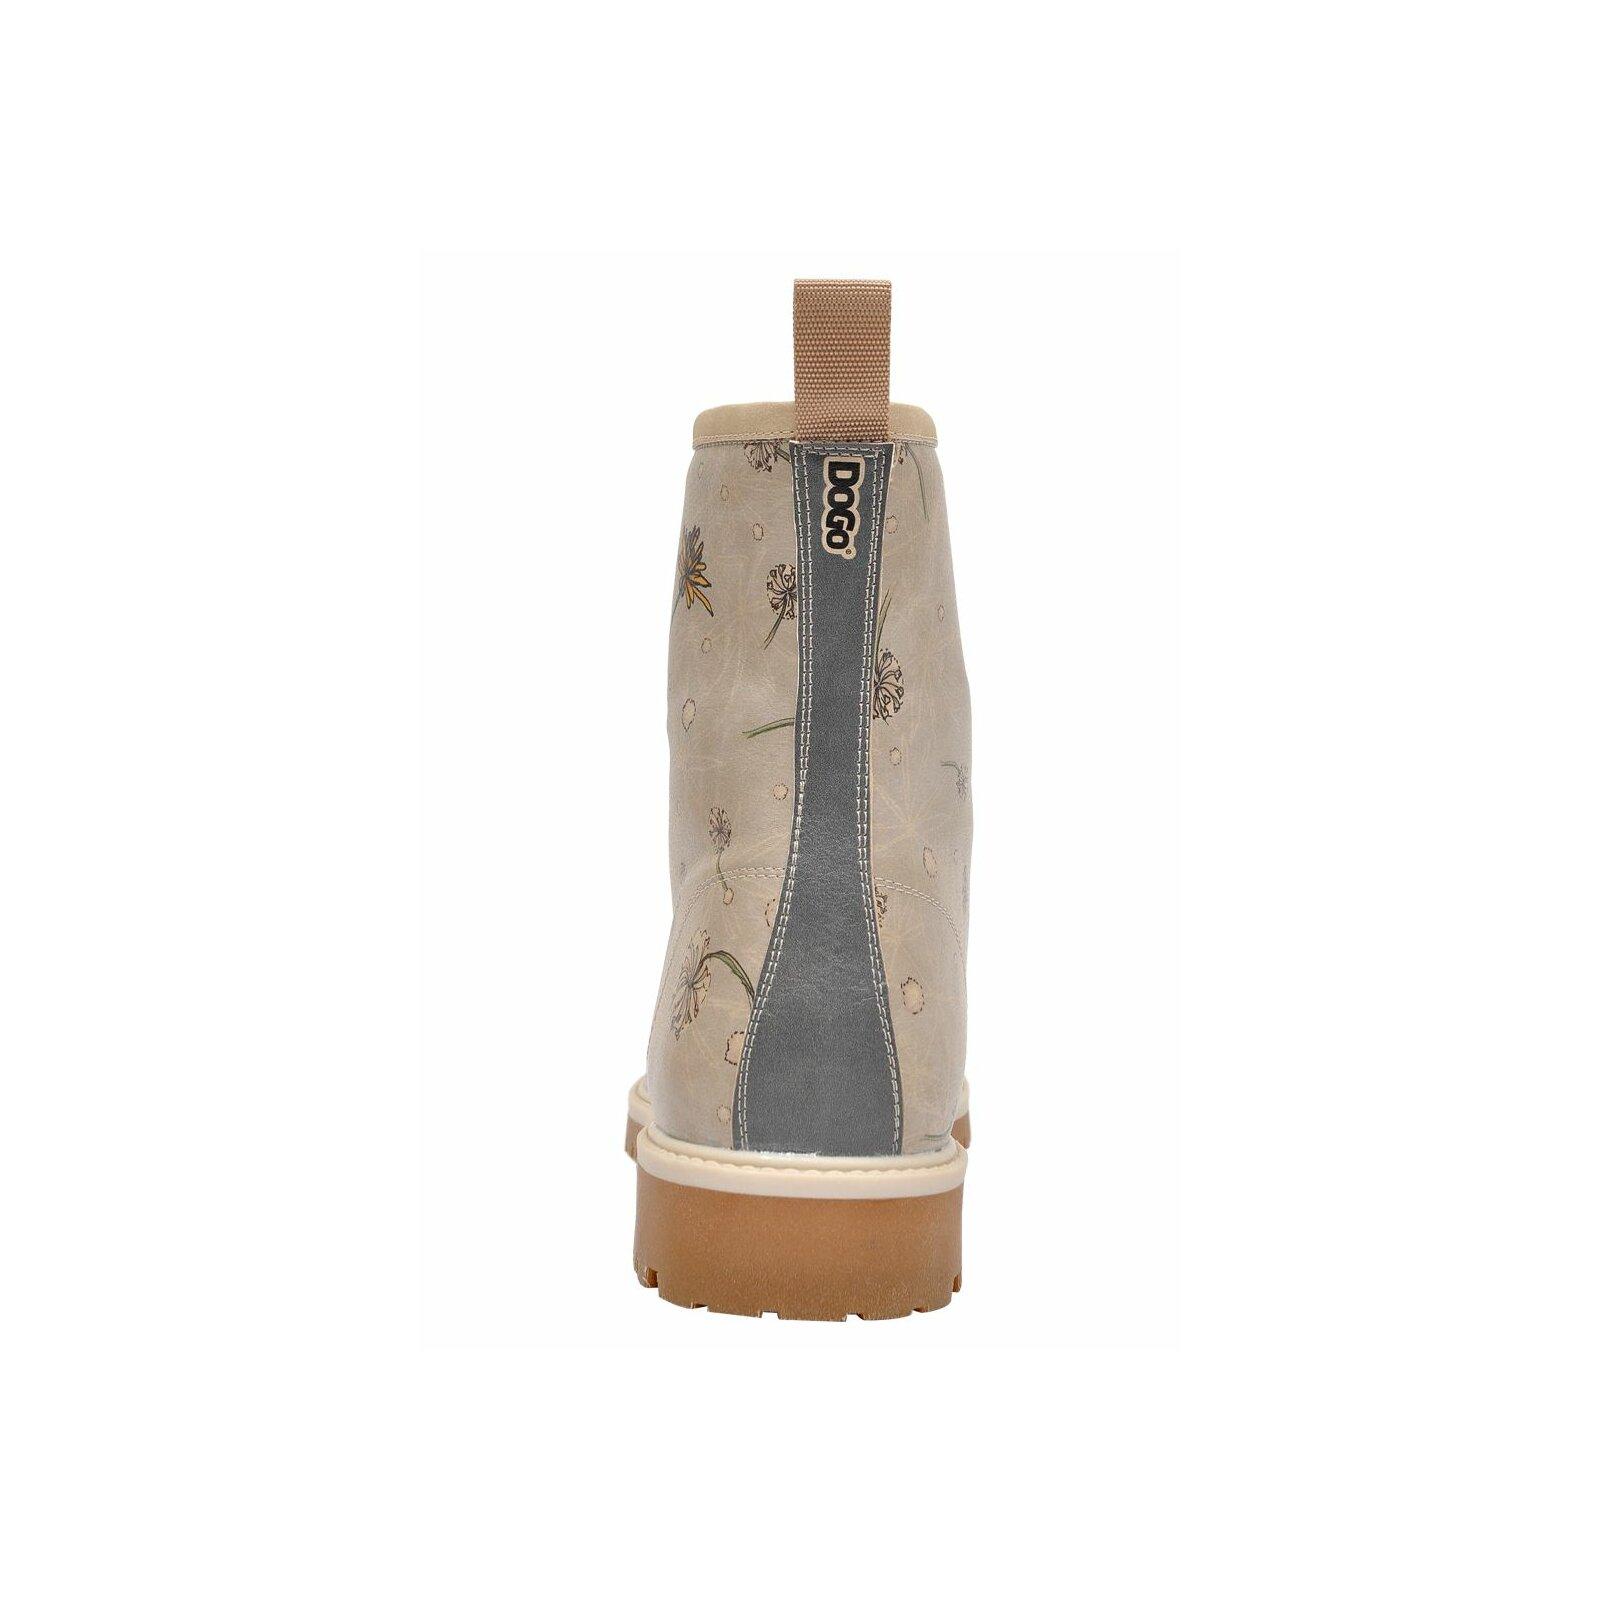 XL=44-46 Oroblu Tights Tessie Strumpfhose Baumwolle Wolle Seide blue artico